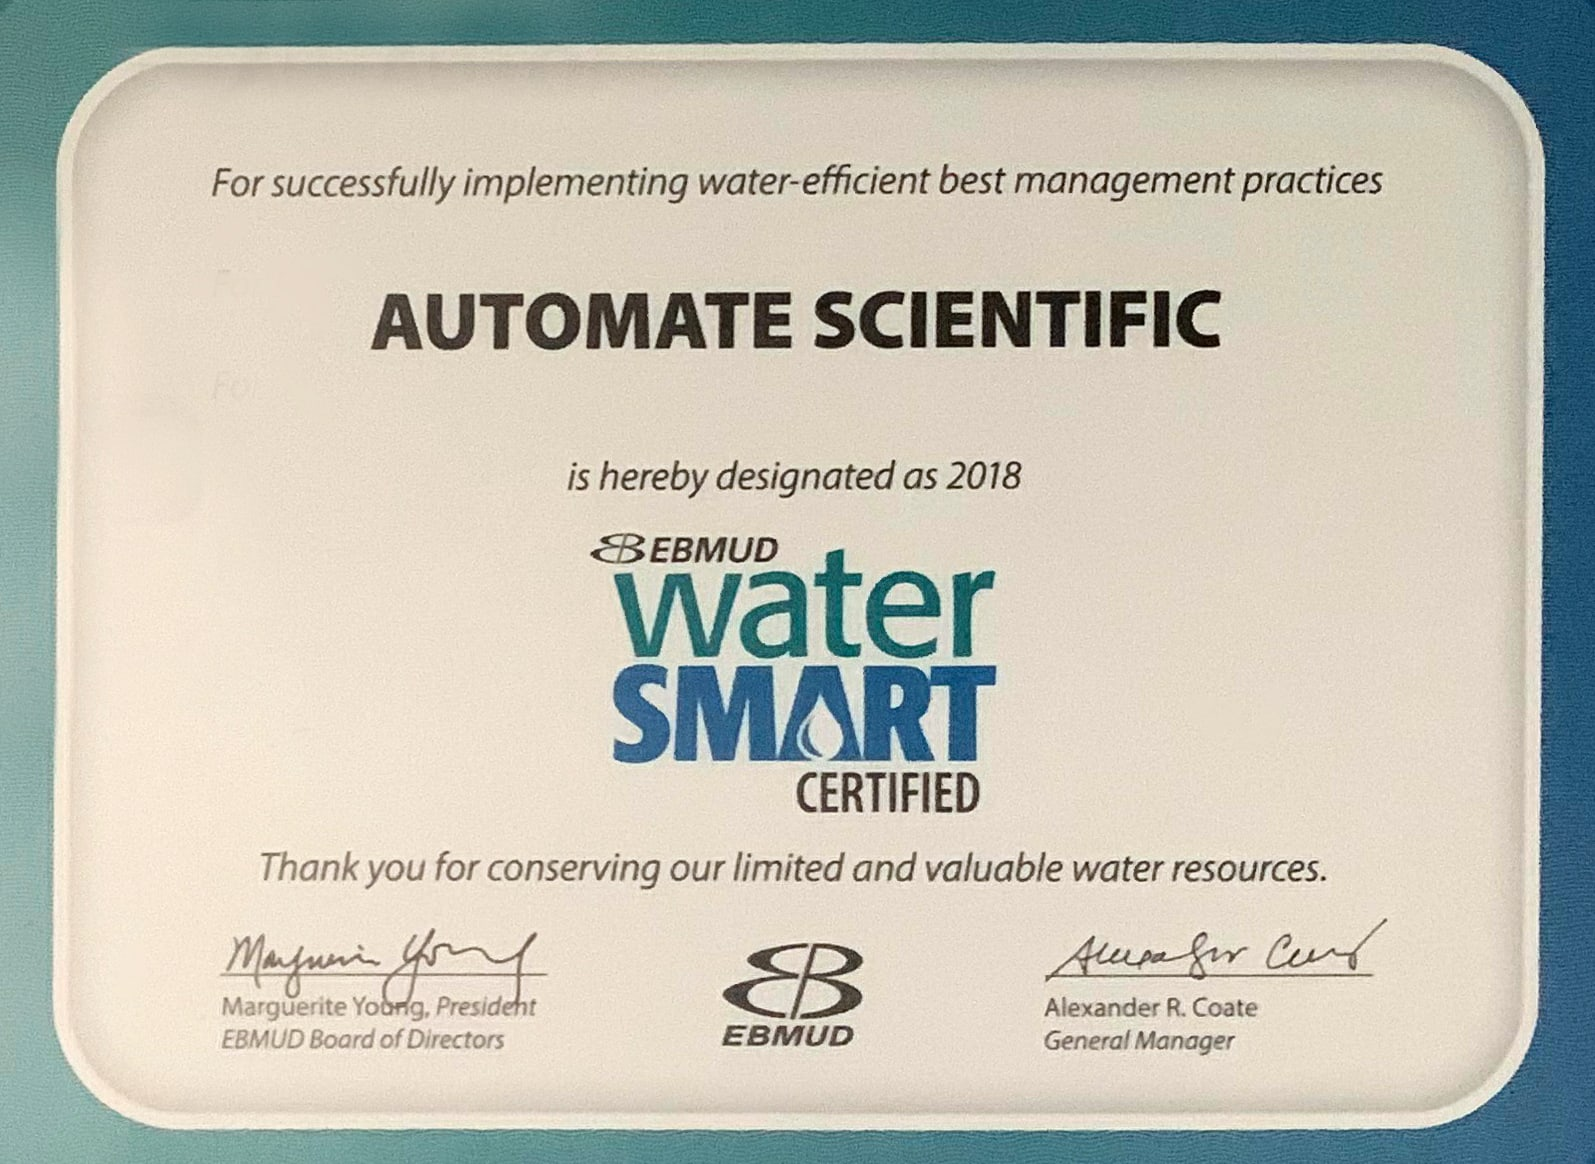 Water Smart EBMUD